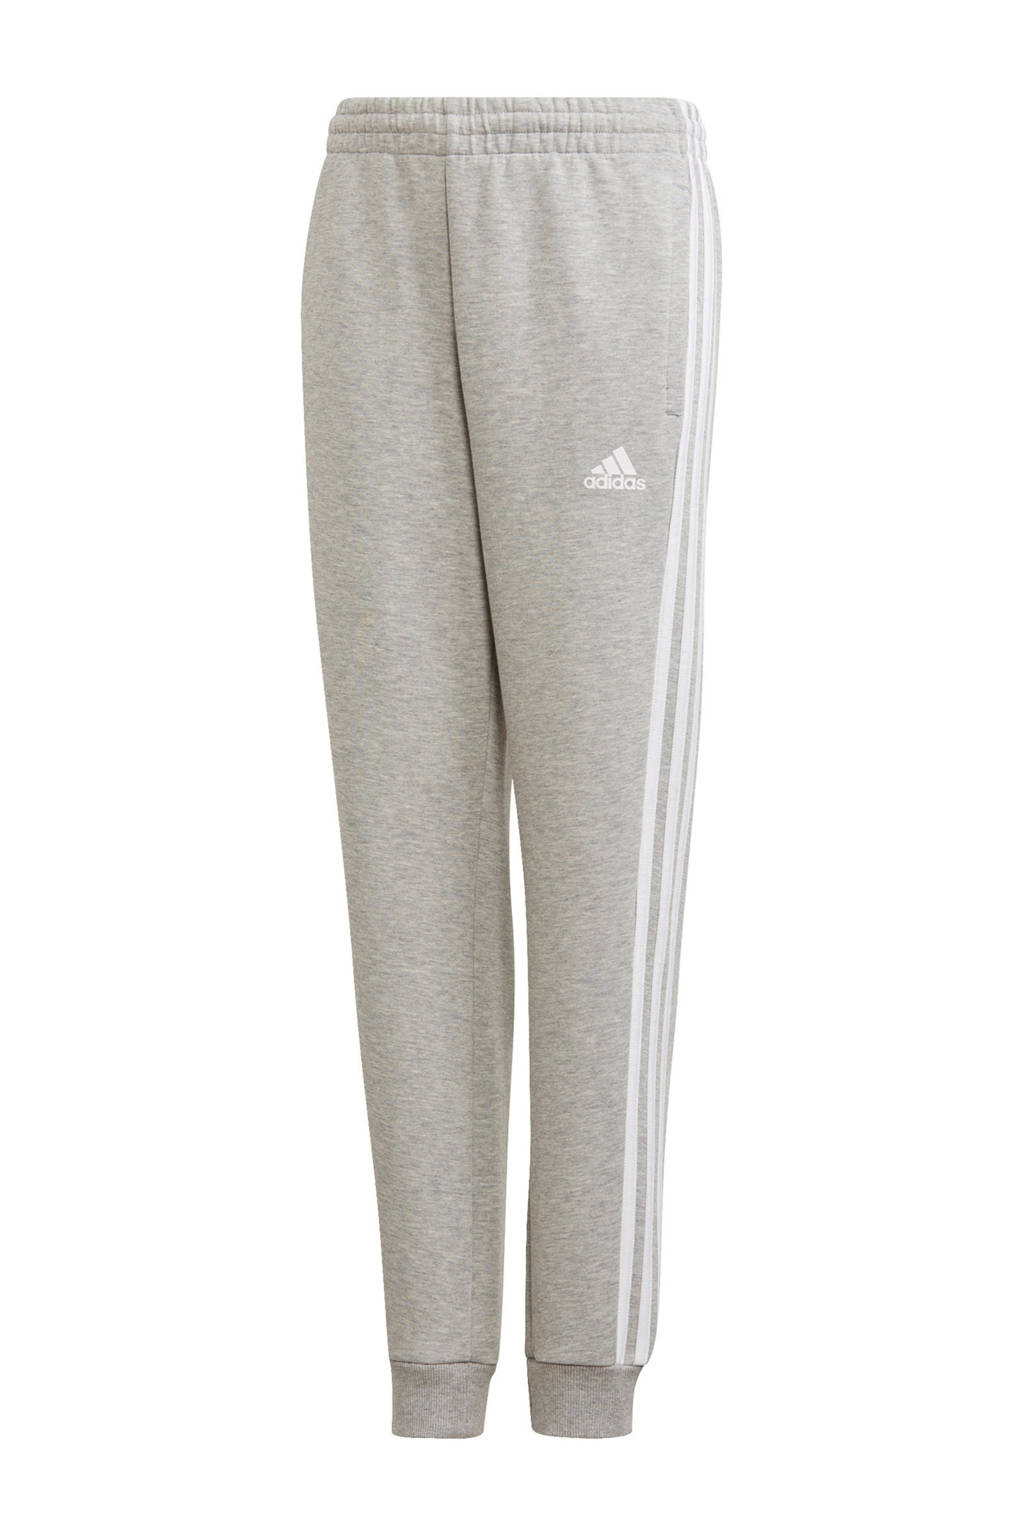 adidas   regular fit joggingbroek grijs melange, Grijs melange